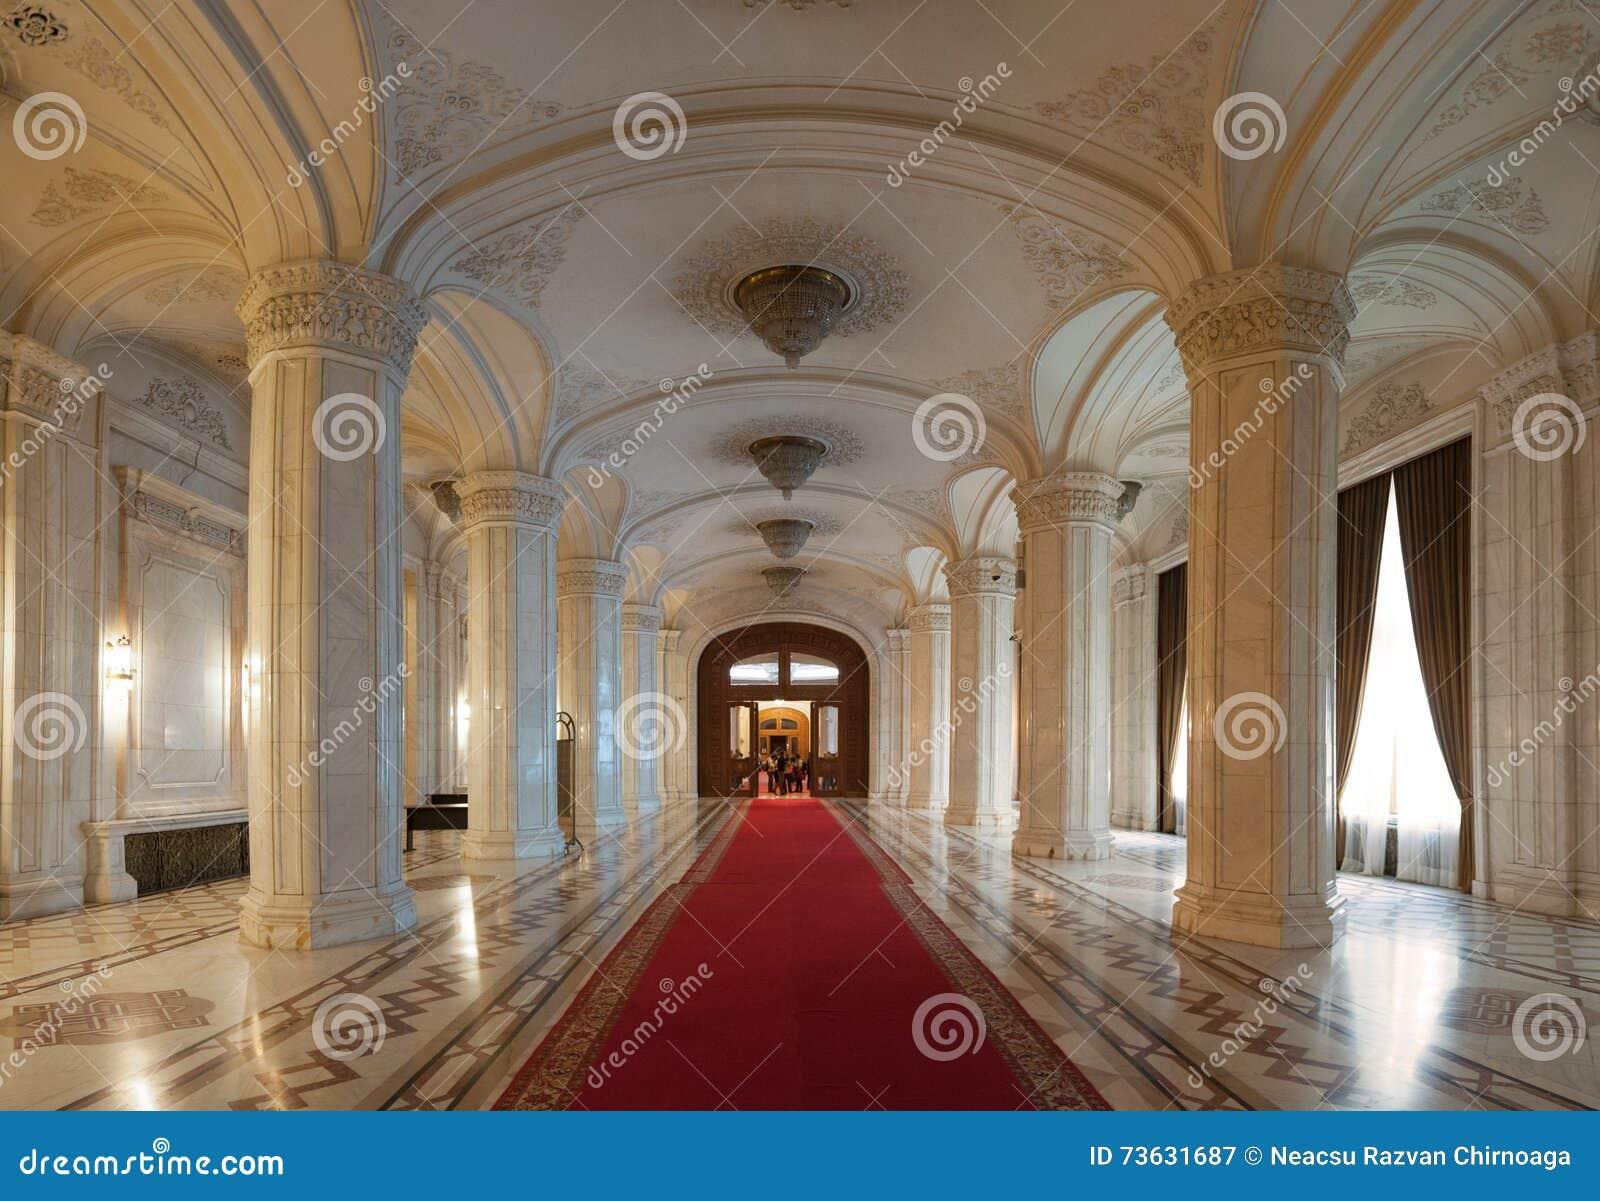 Innenaufnahme mit dem Palast des Parlaments